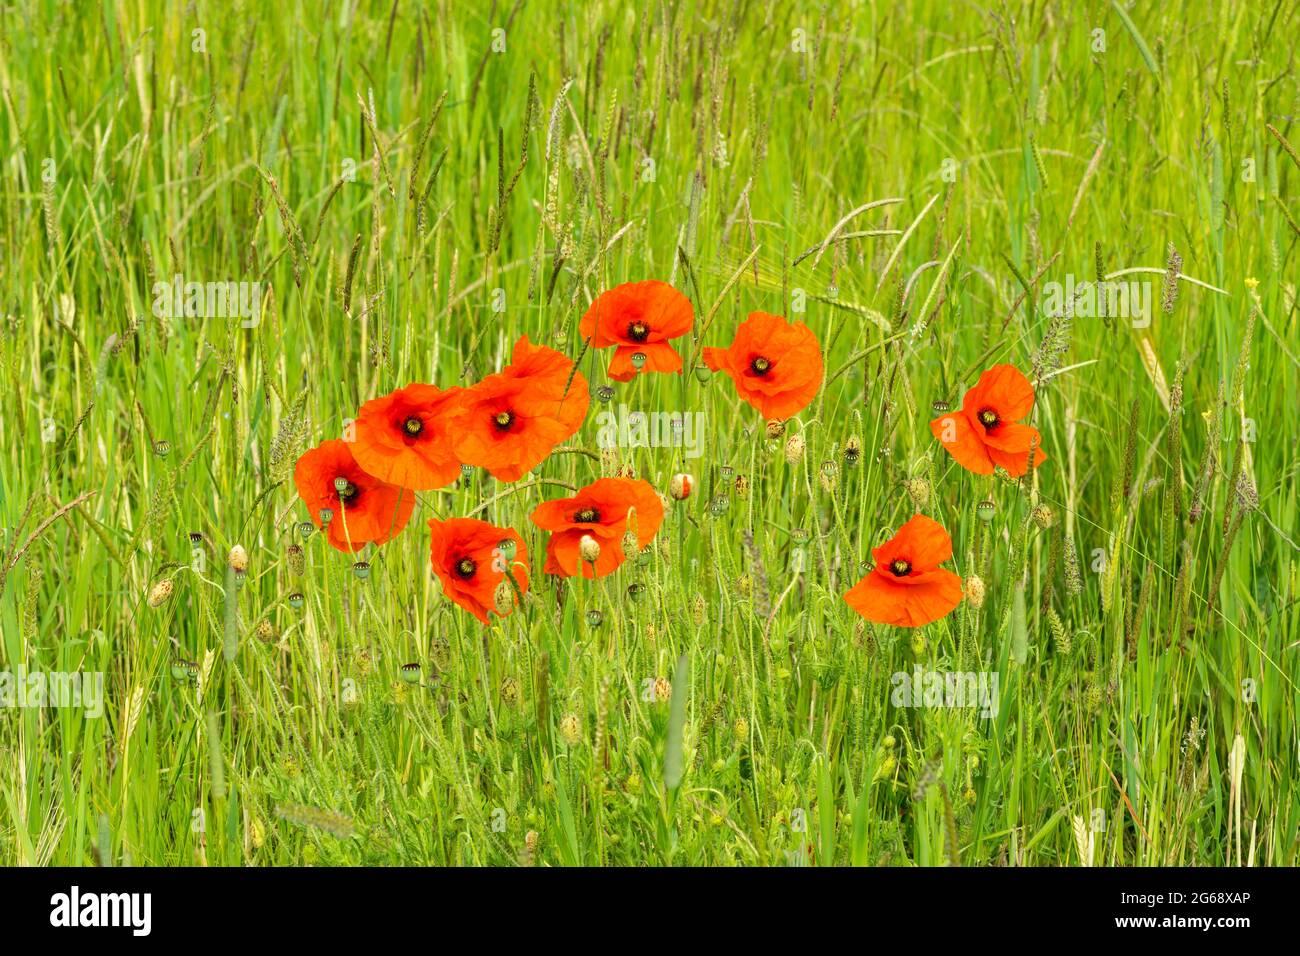 poppies-growing-wild-in-grass-meadow-2G68XAP.jpg